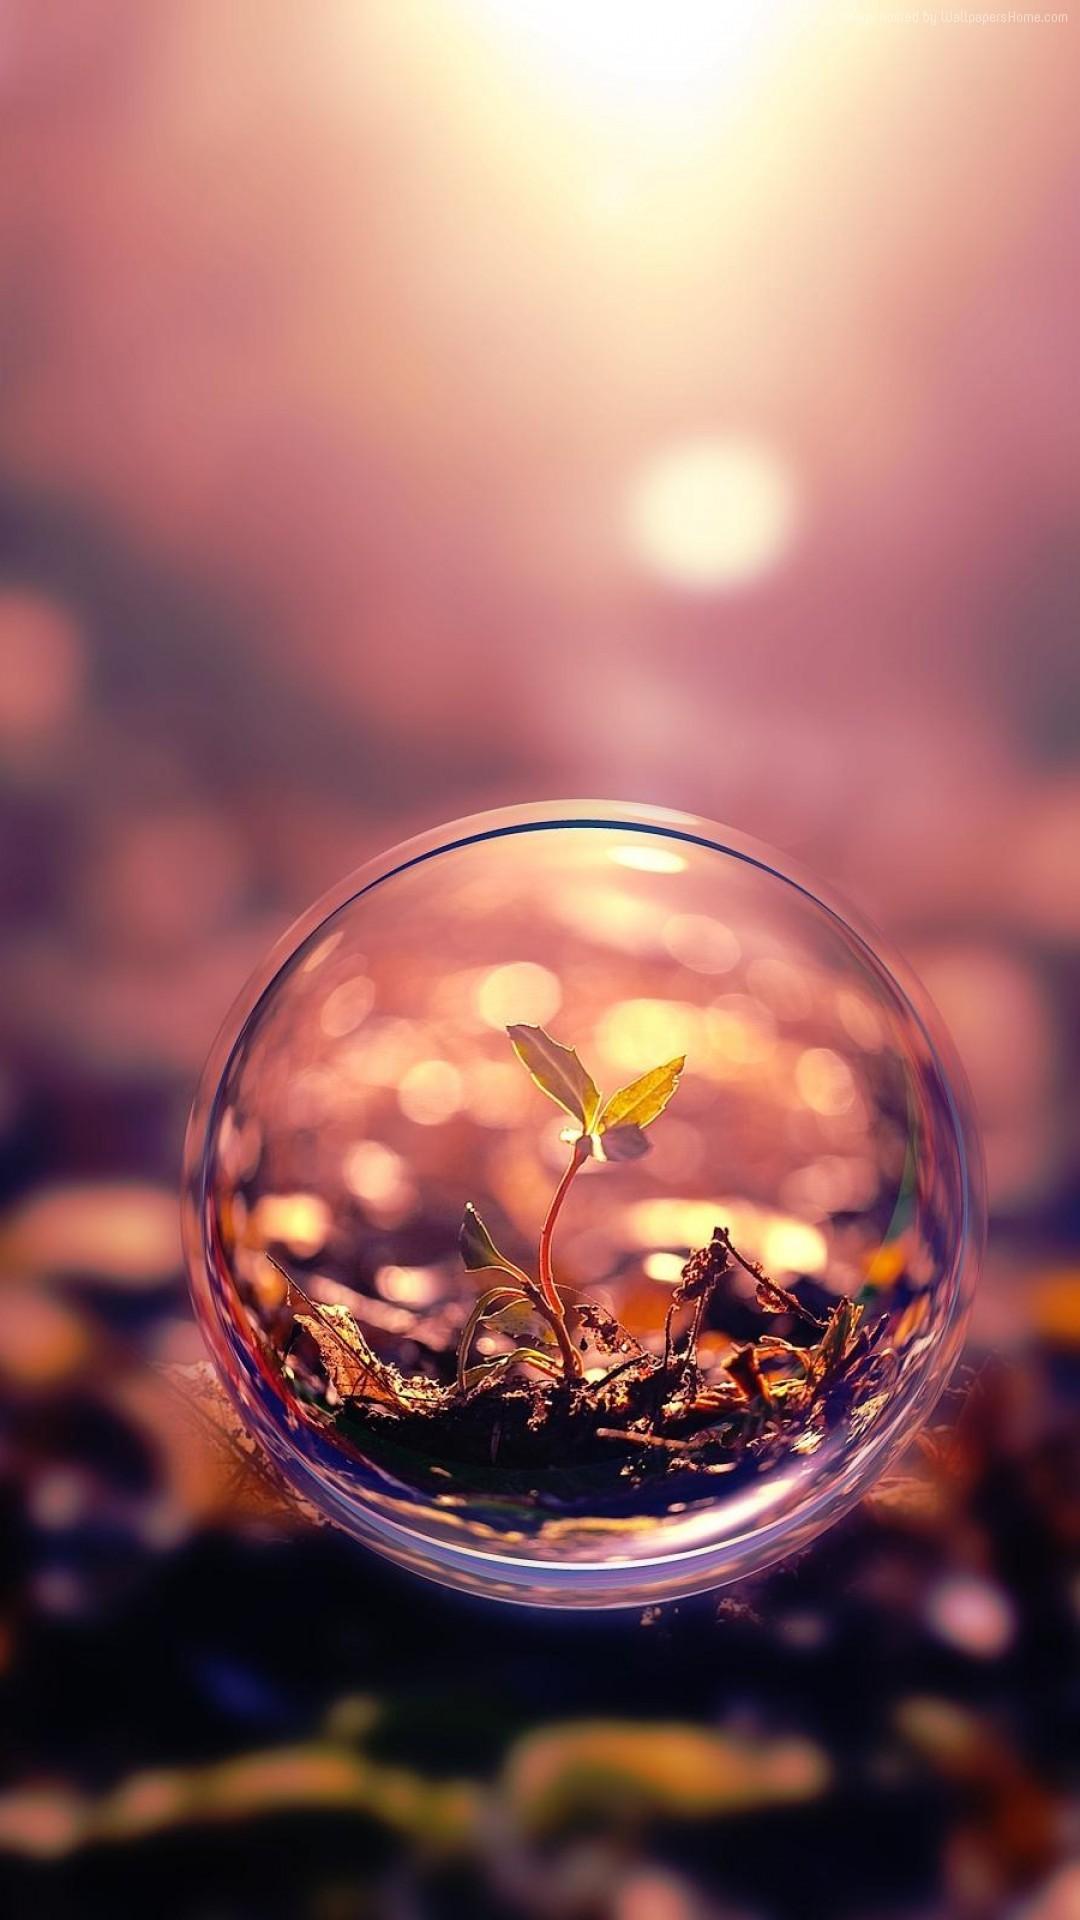 sfera wallpaper iPhone 7 sphere 4k hd wallpaper background sunset  transparent plant